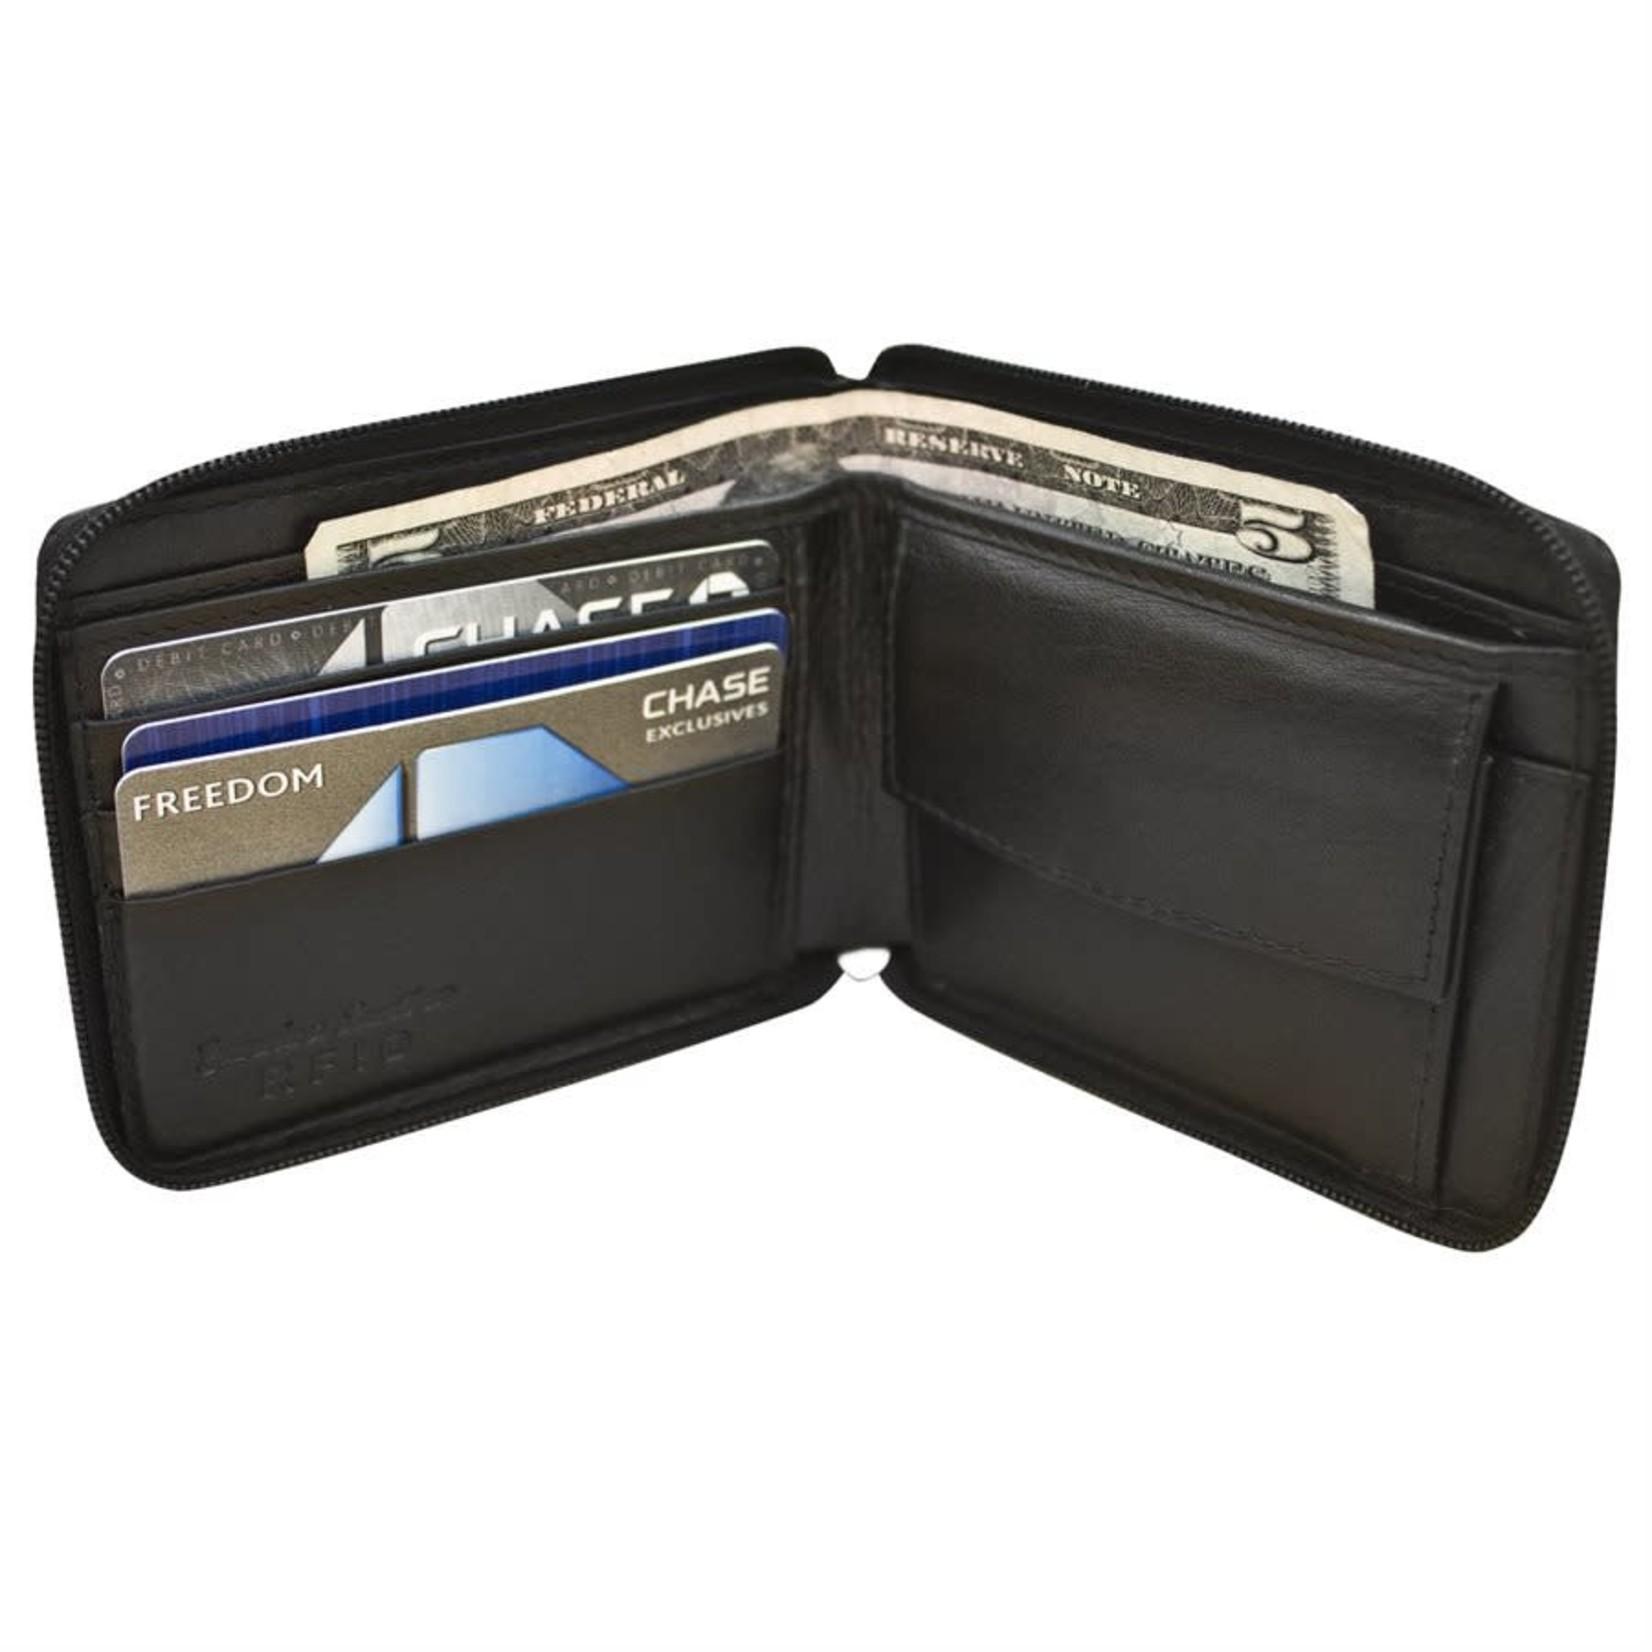 Leather Handbags and Accessories 7765 Black - RFID Zip Around BiFold Men's Wallet